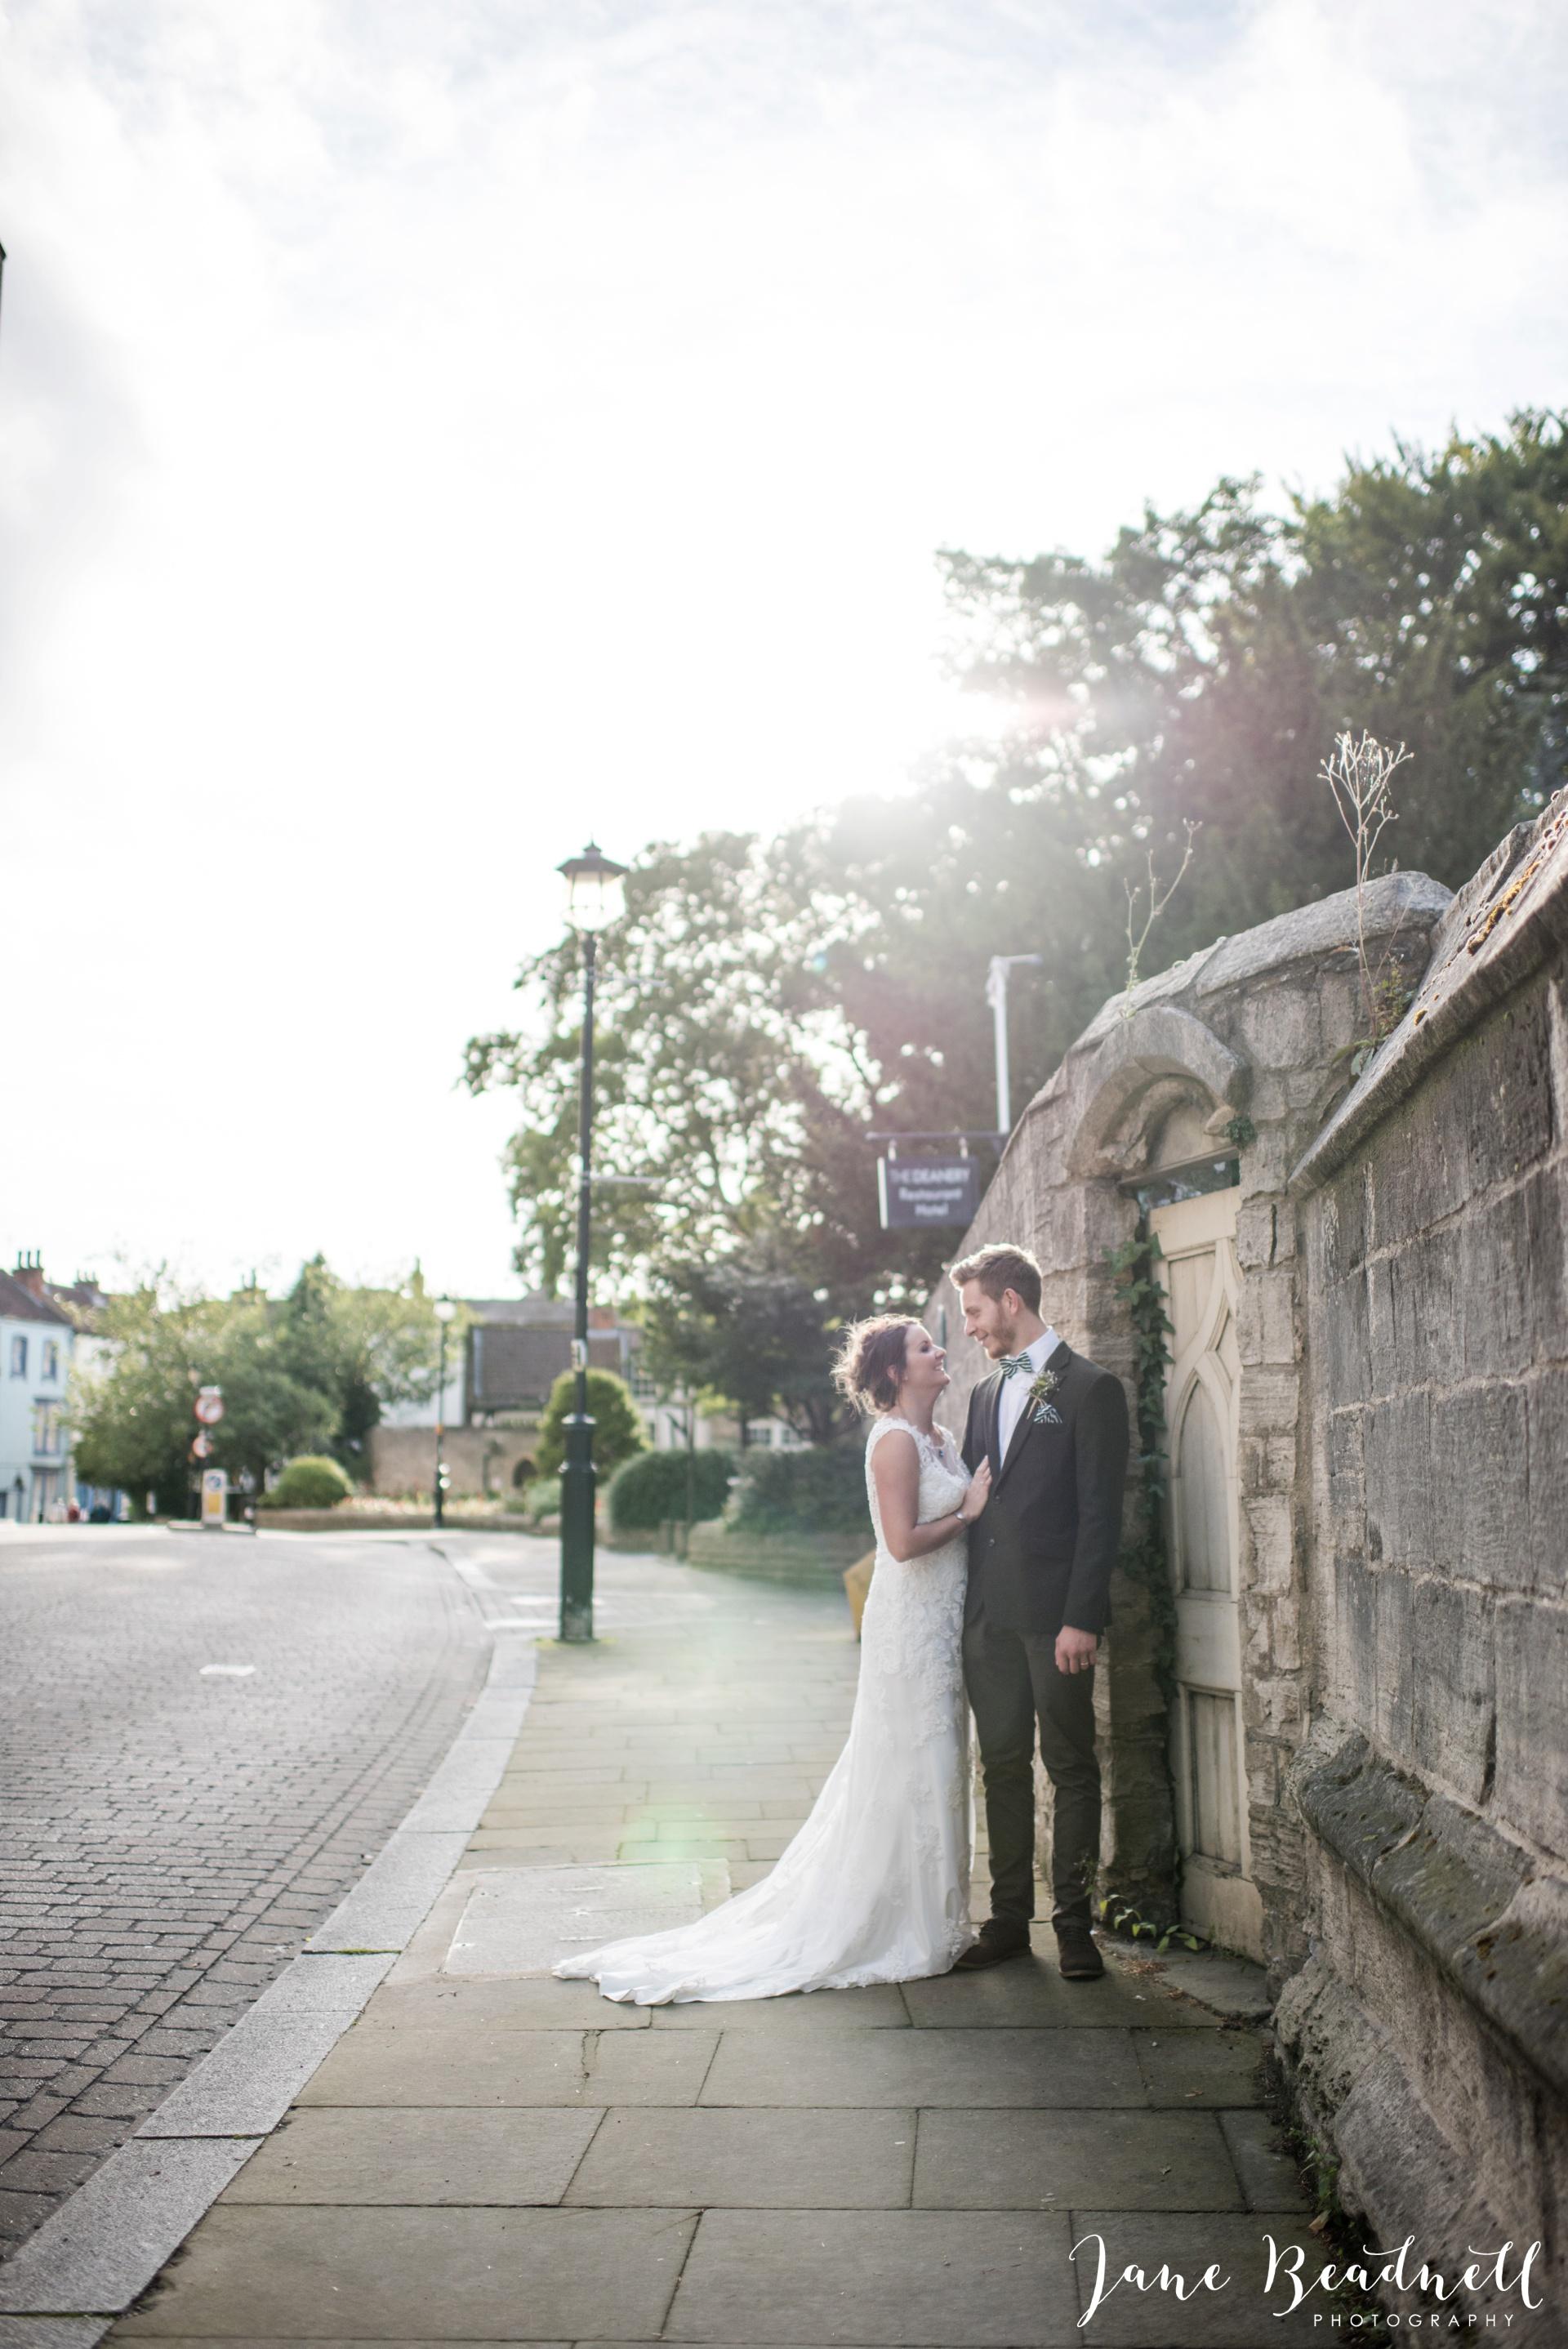 Jane Beadnell fine art wedding photographer The Old Deanery Ripon_0092